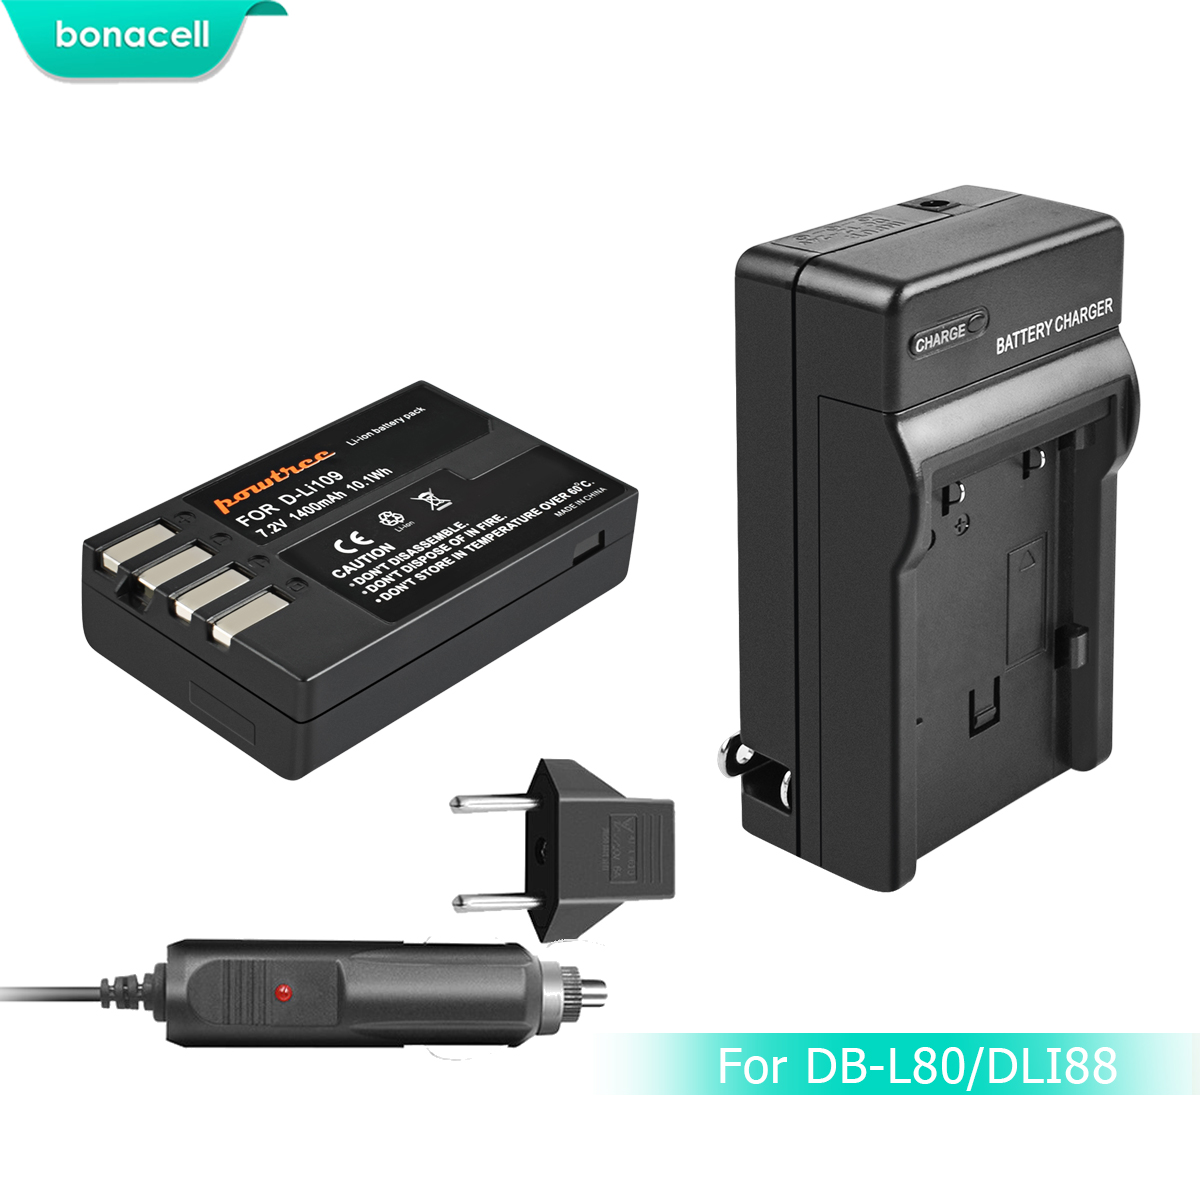 T19 Bluetooth Car 2 USB Charger FM Transmitter Wireless Radio MP3 Player lot BG2